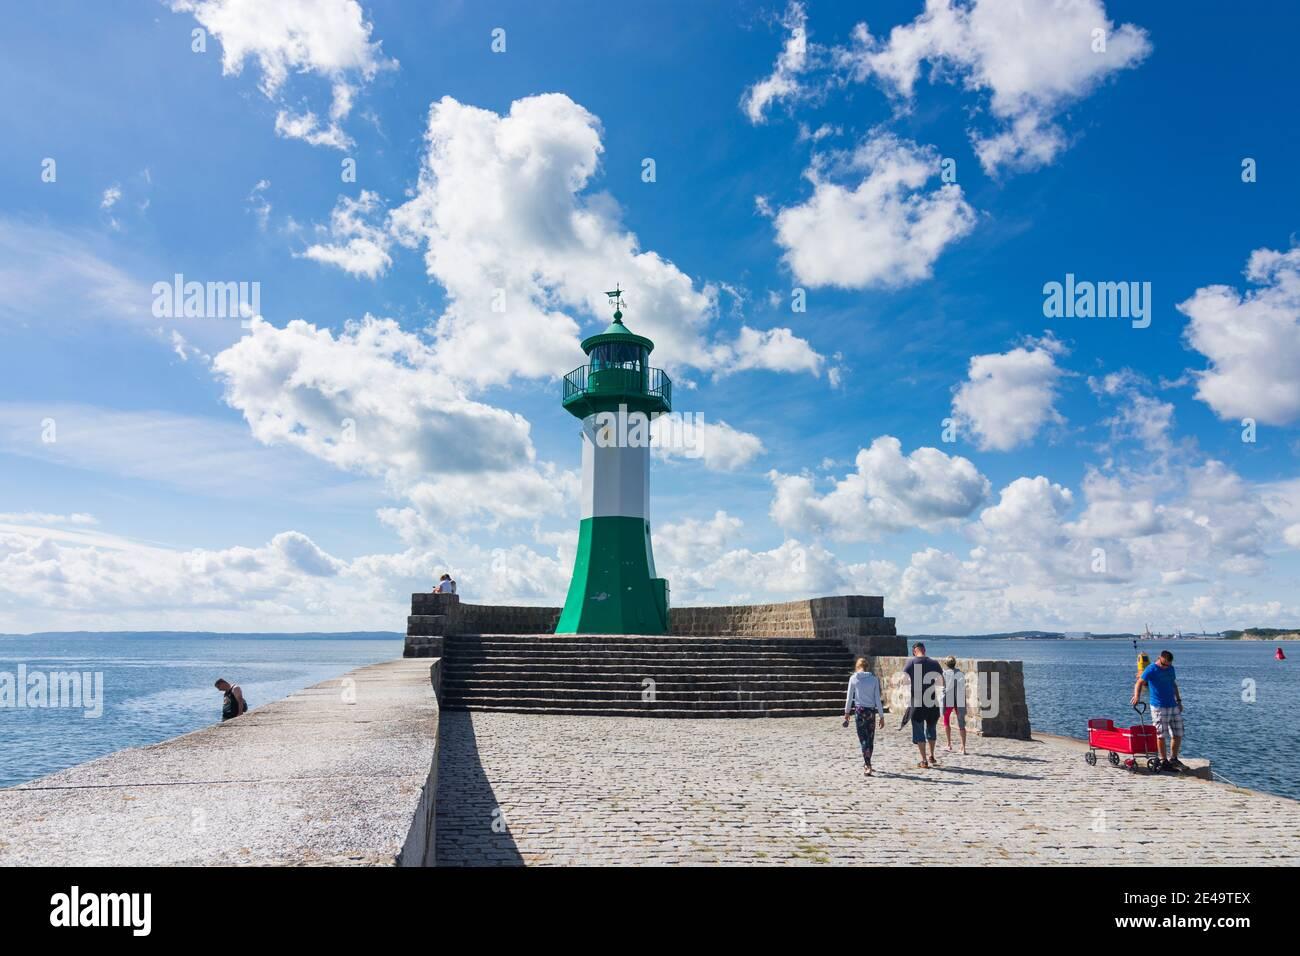 Sassnitz, light house East Mole, port, Baltic Sea, Ostsee (Baltic Sea), Rügen Island, Mecklenburg-Vorpommern / Mecklenburg-Western Pomerania, Germany Stock Photo